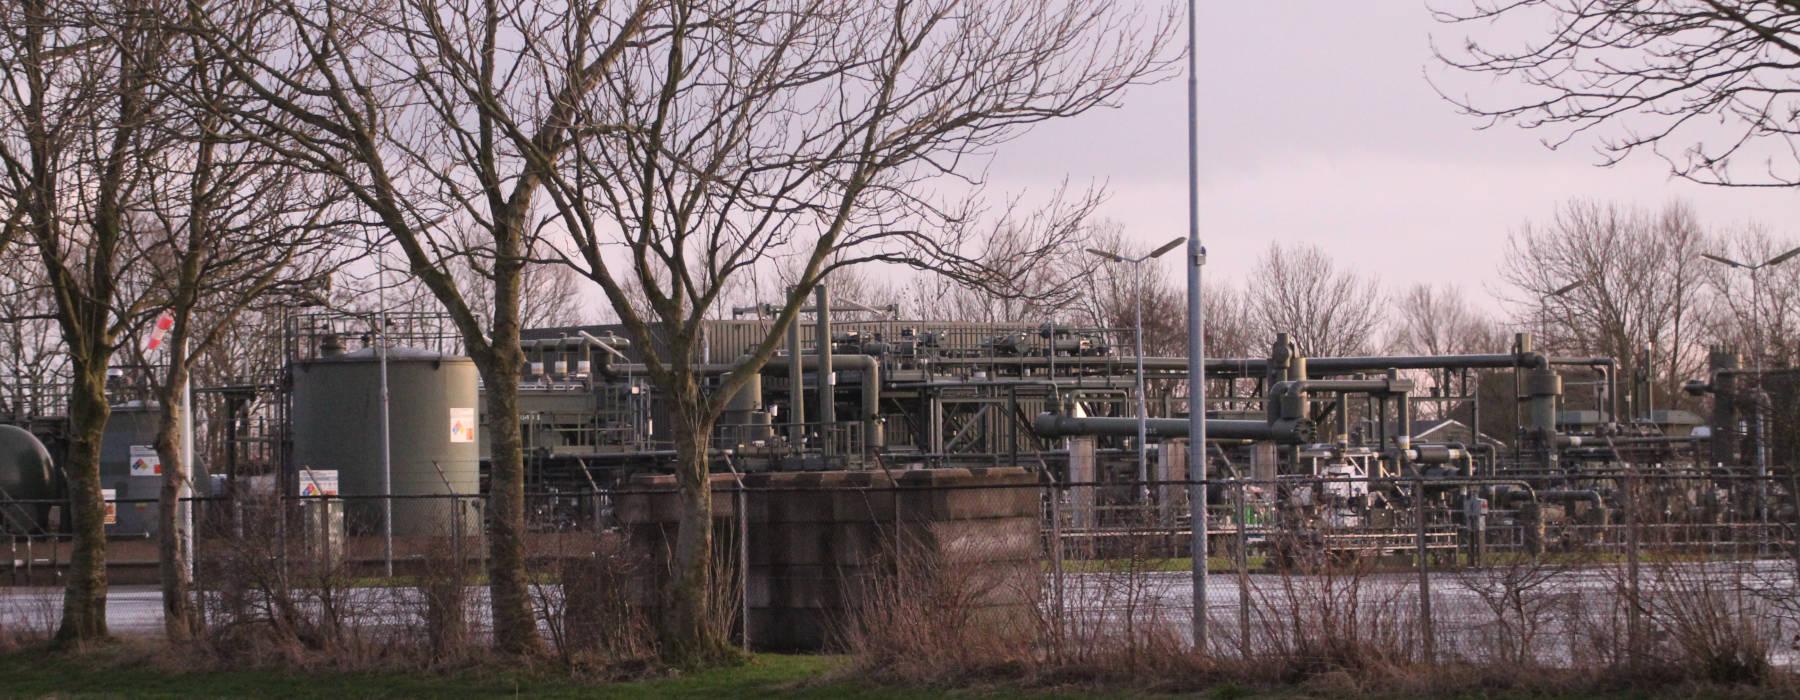 FNP nijs lanskip 1 gas saltwinning